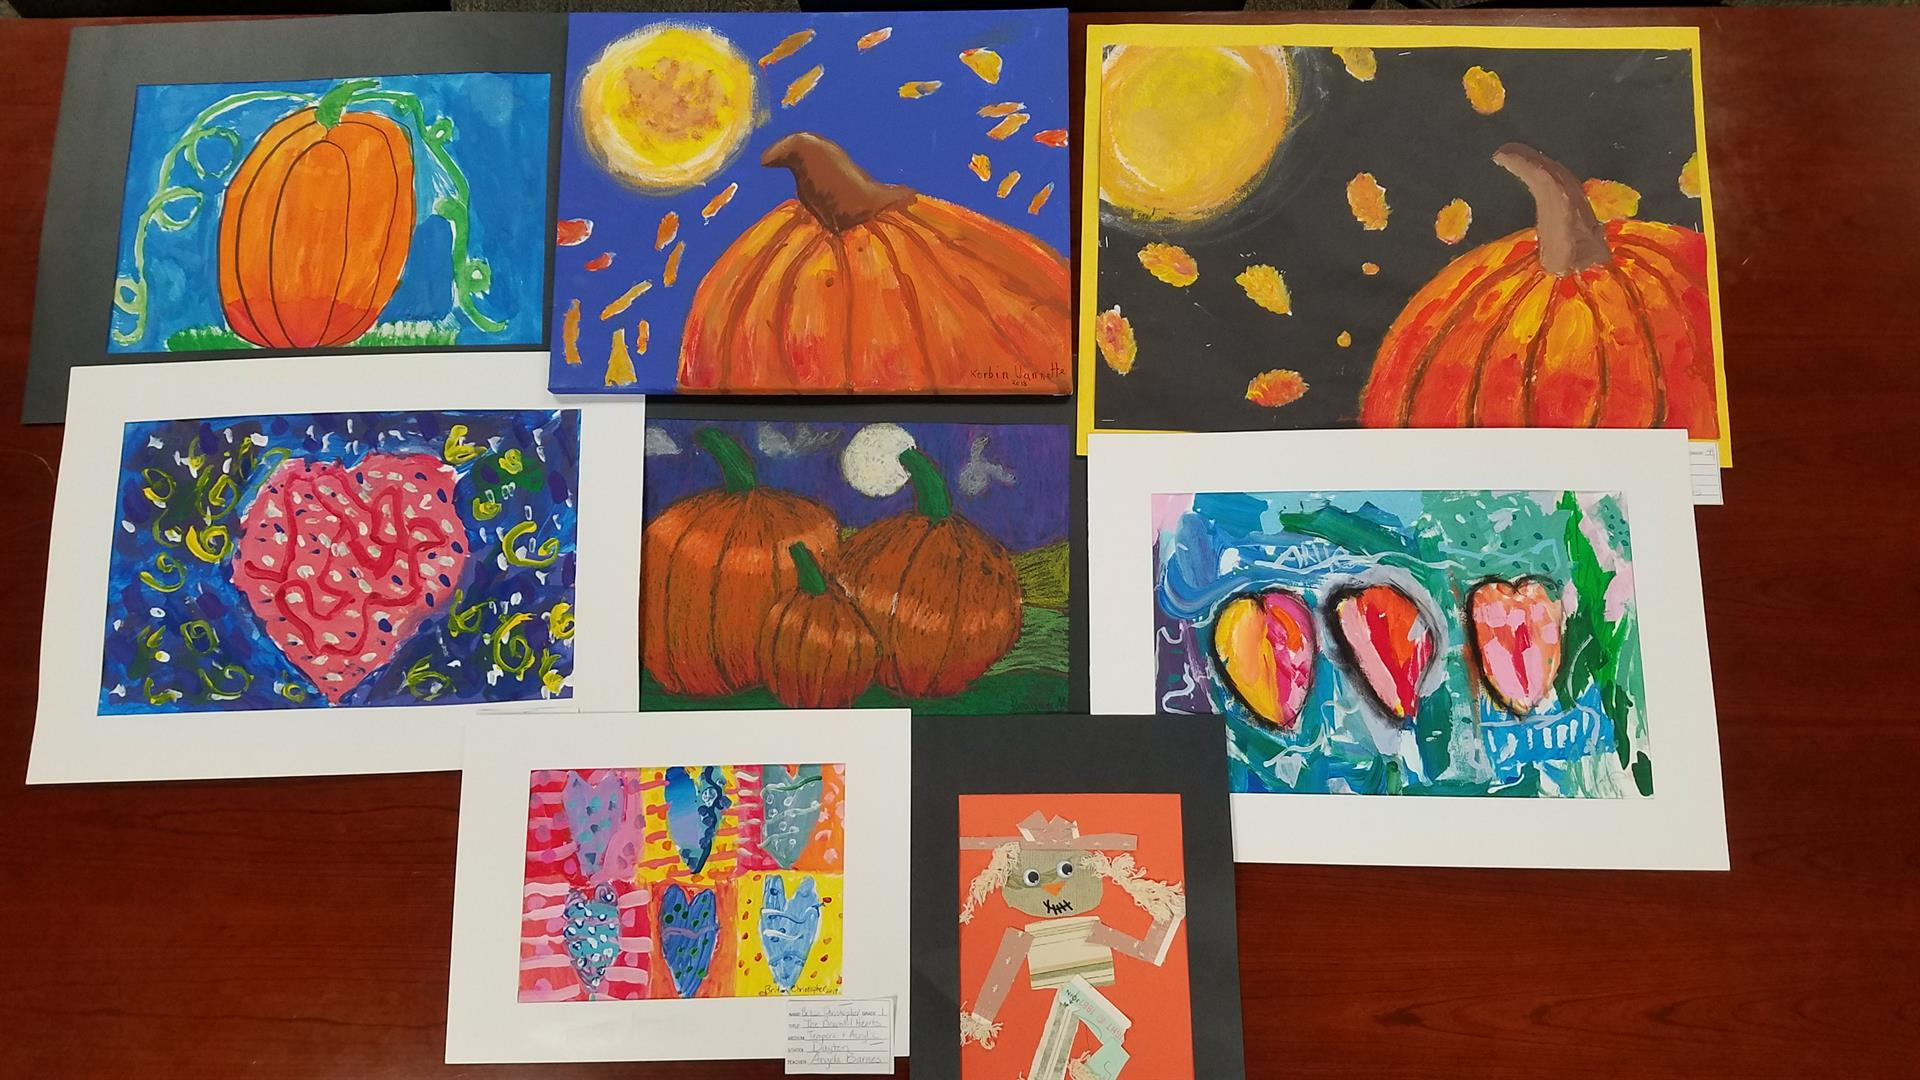 Artwork from students at Dayton.